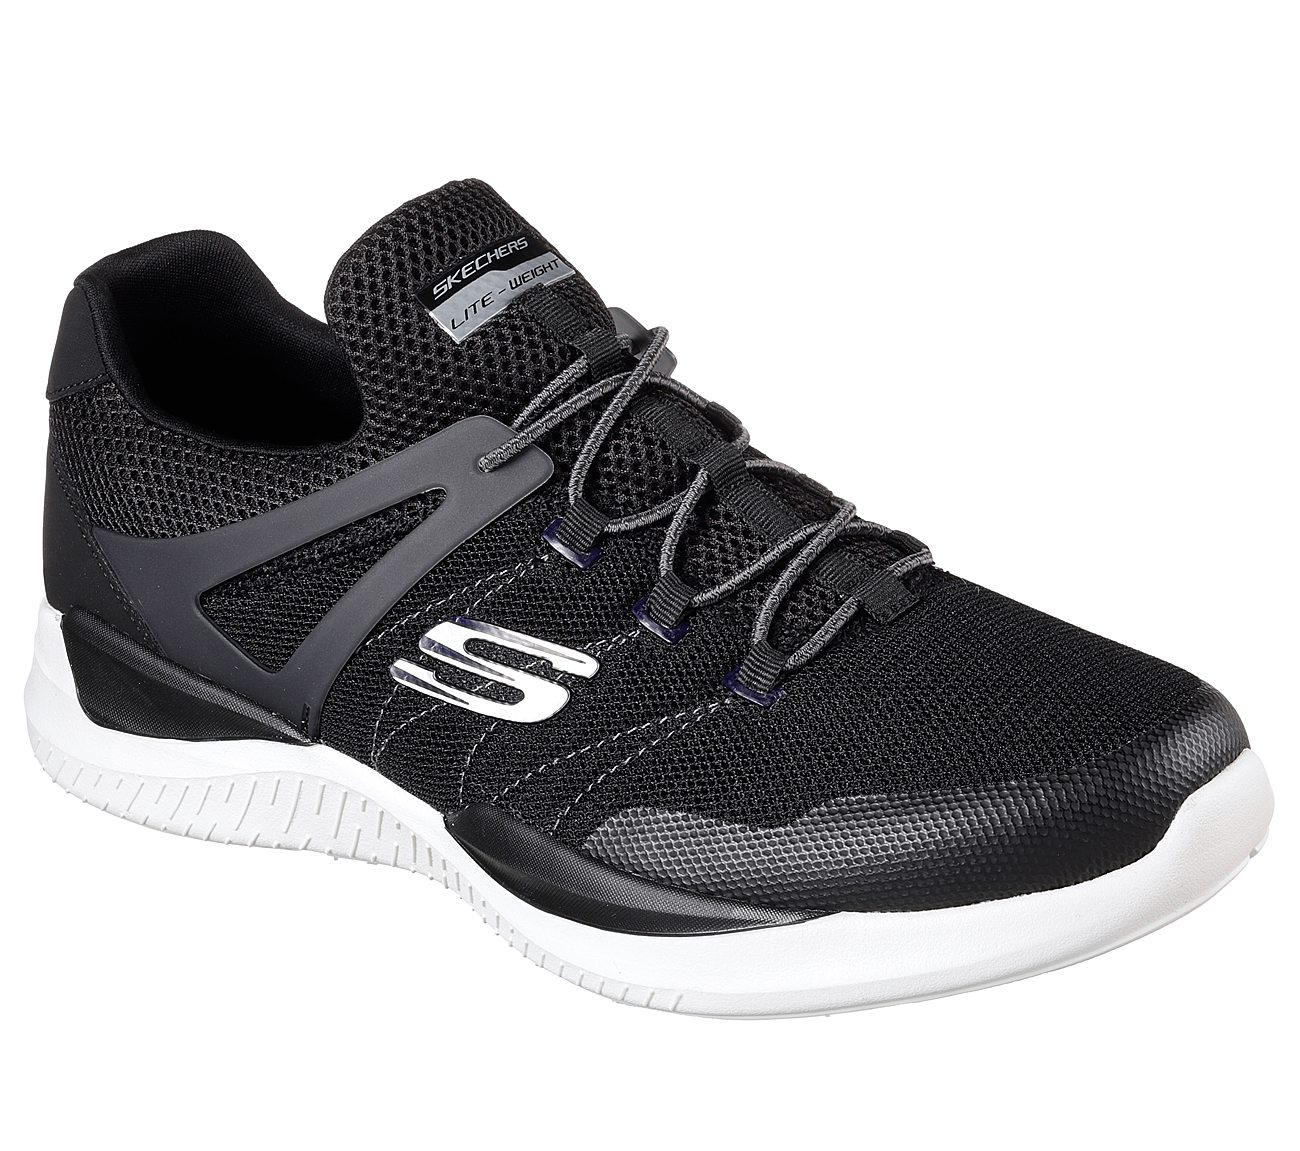 Buy Skechers Matrixx Kingdon Skechers Sport Shoes